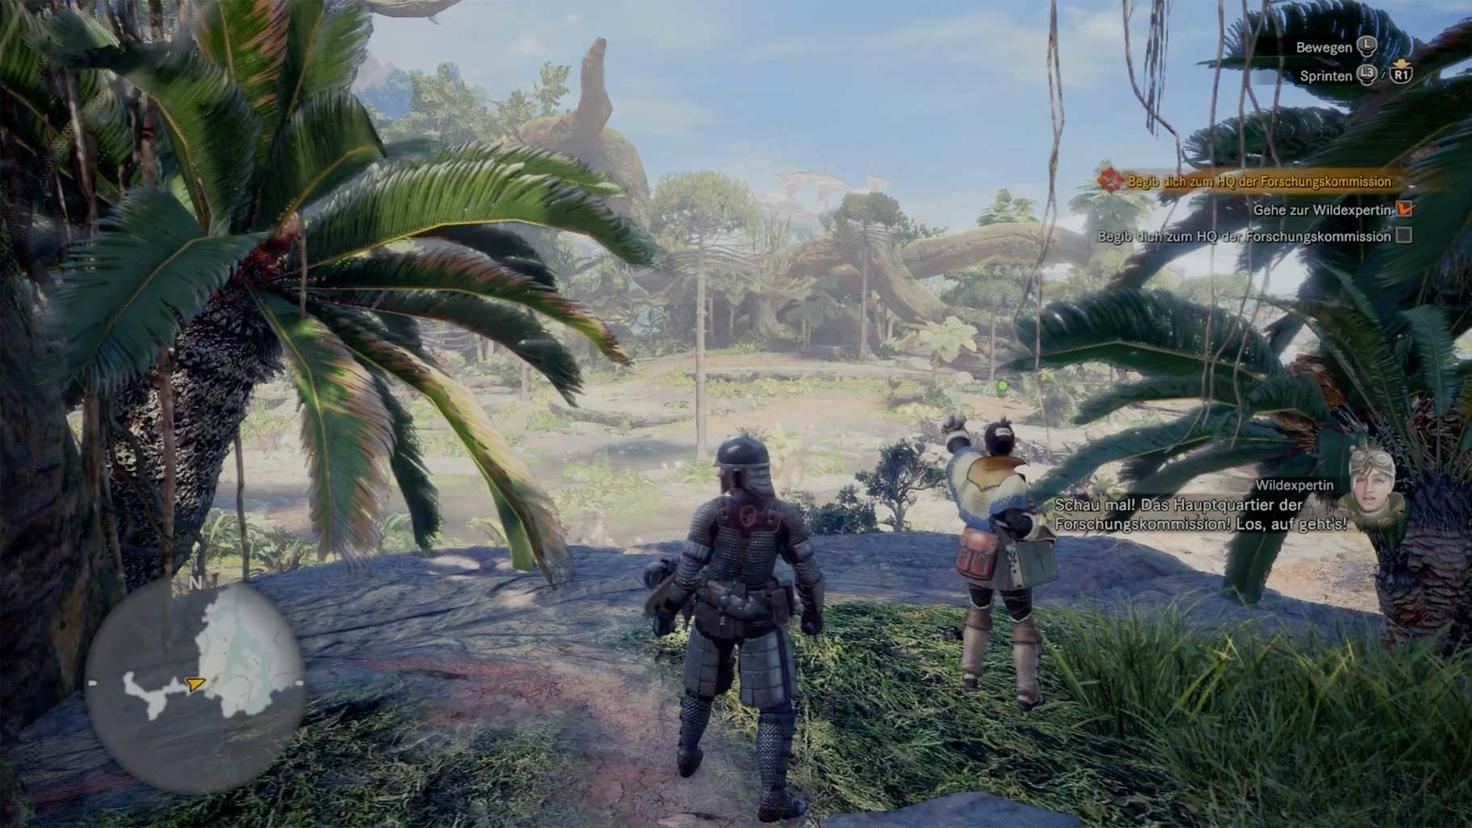 monster-hunter-world-screenshot-02